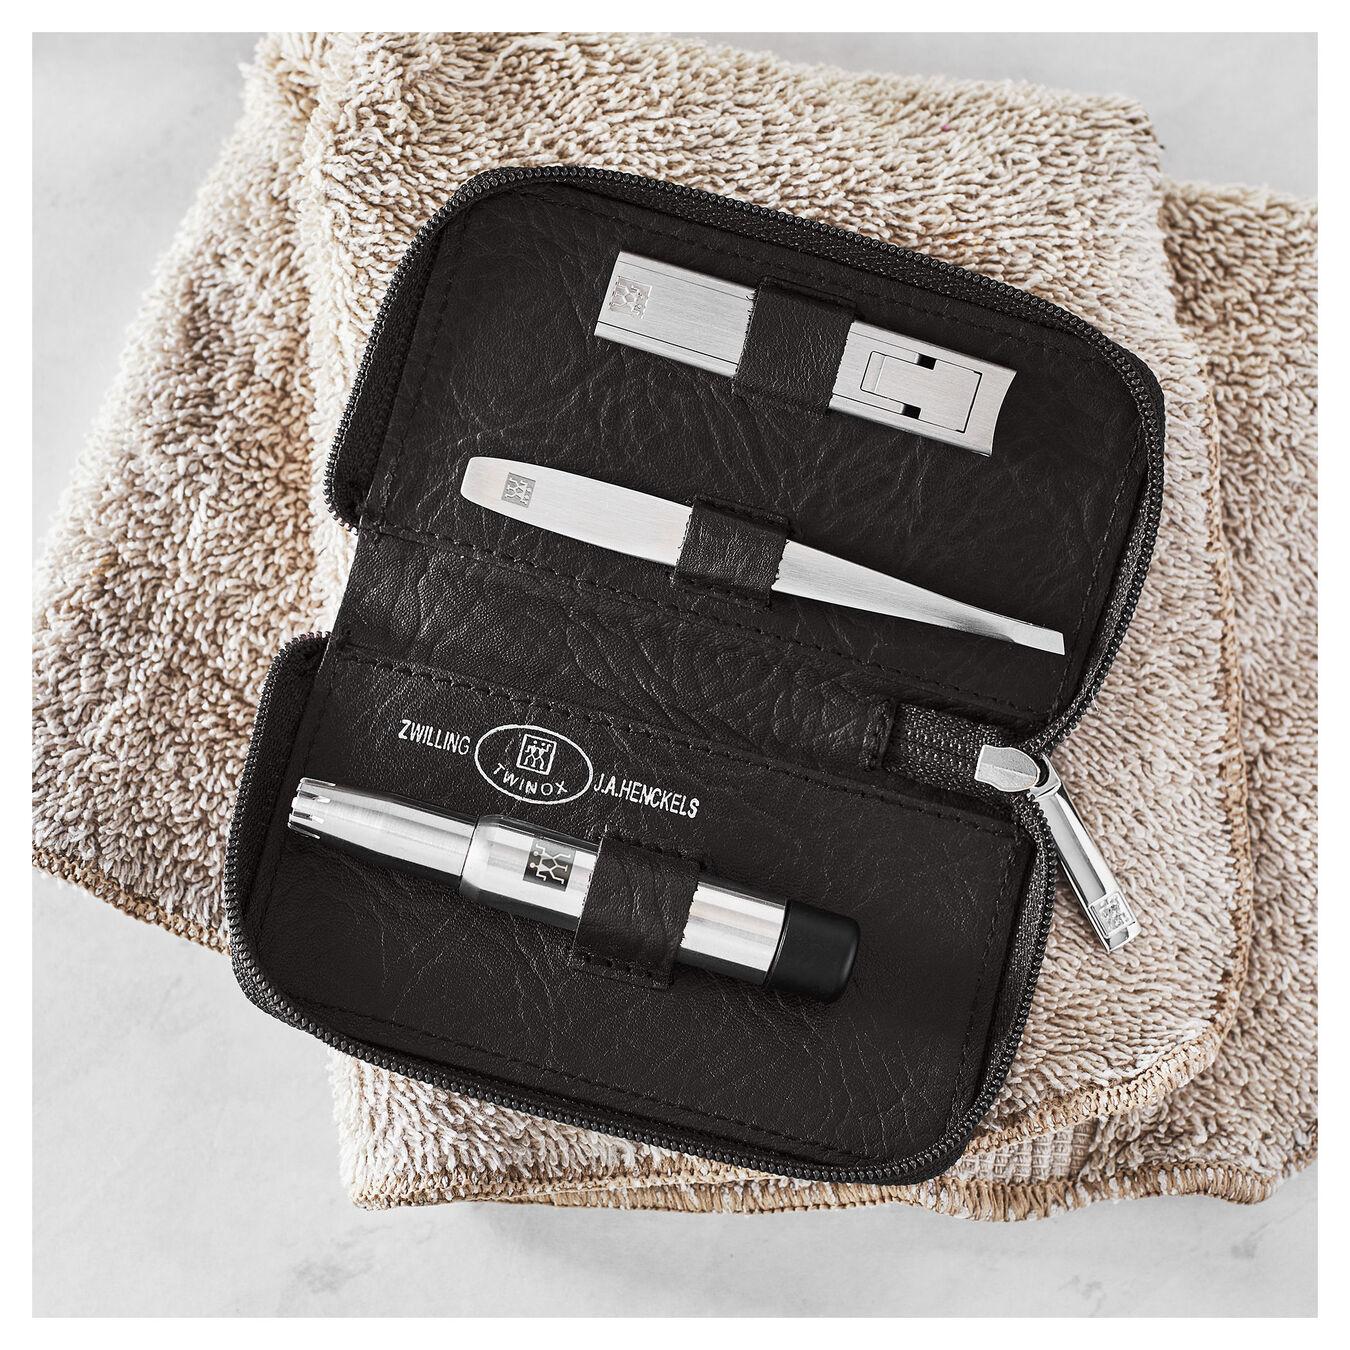 Zip fastener case, 4 Piece   special formula steel   brown,,large 3